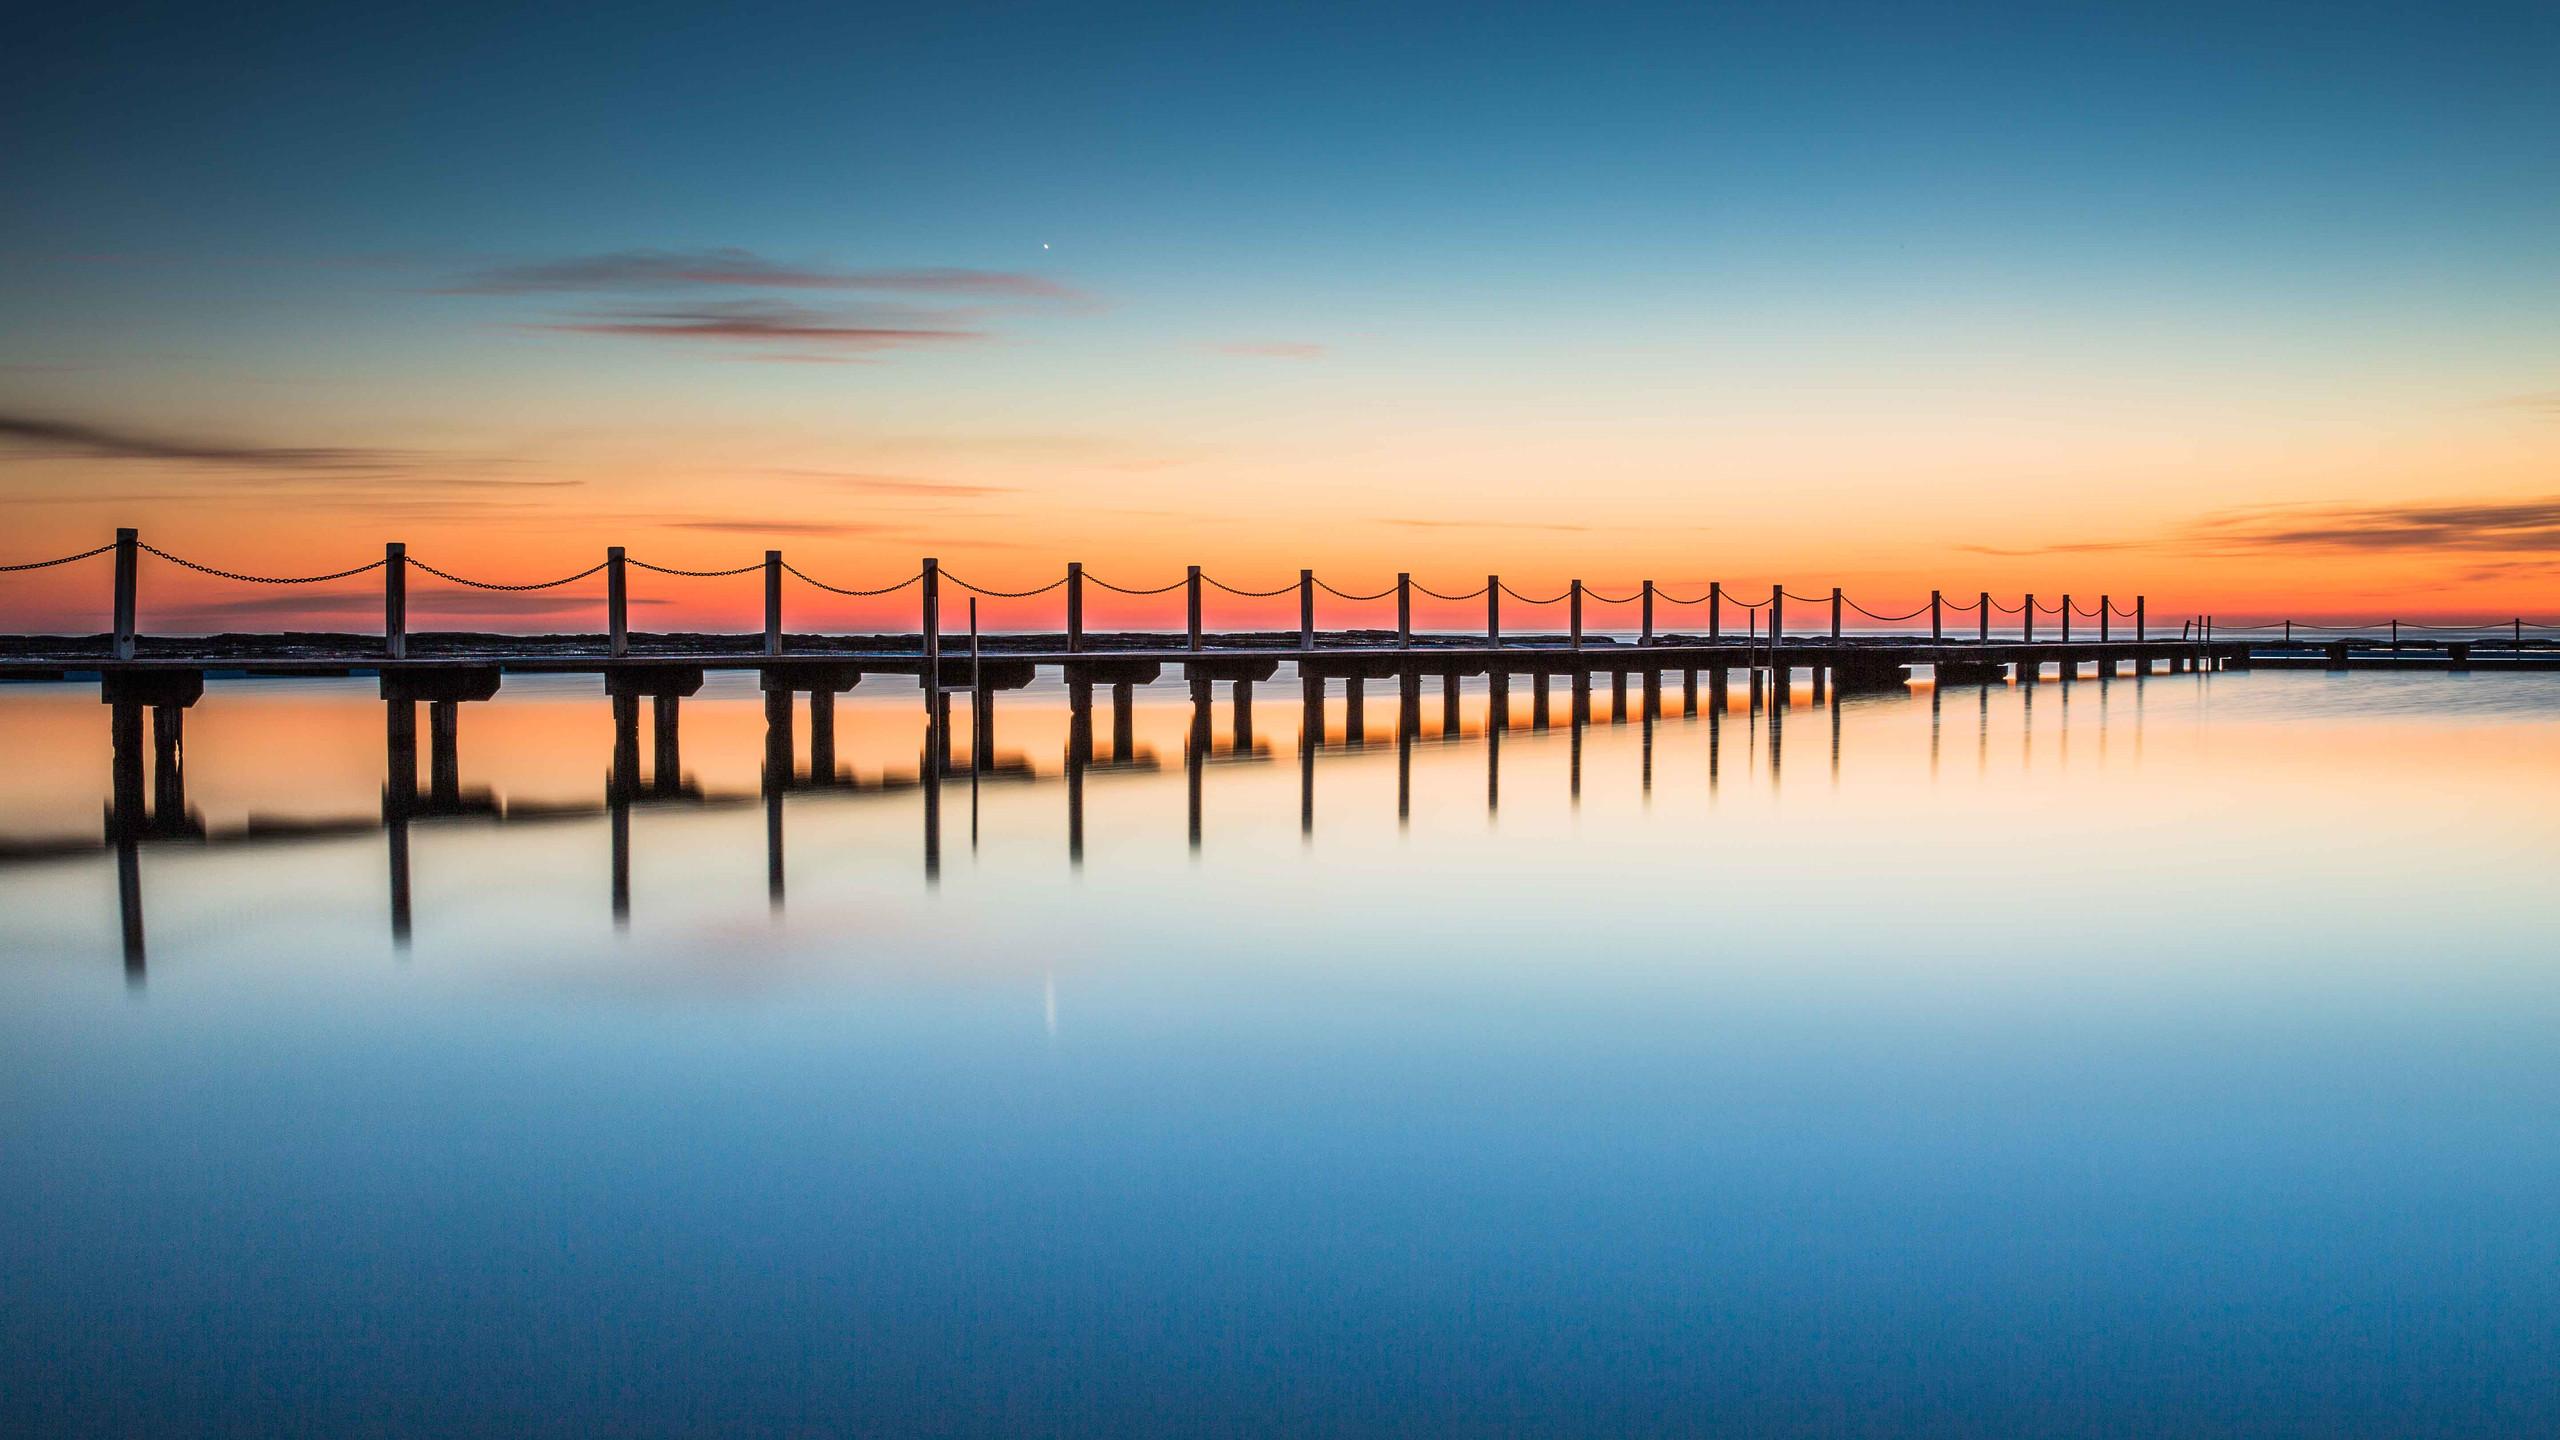 Timber boardwalk Reflection